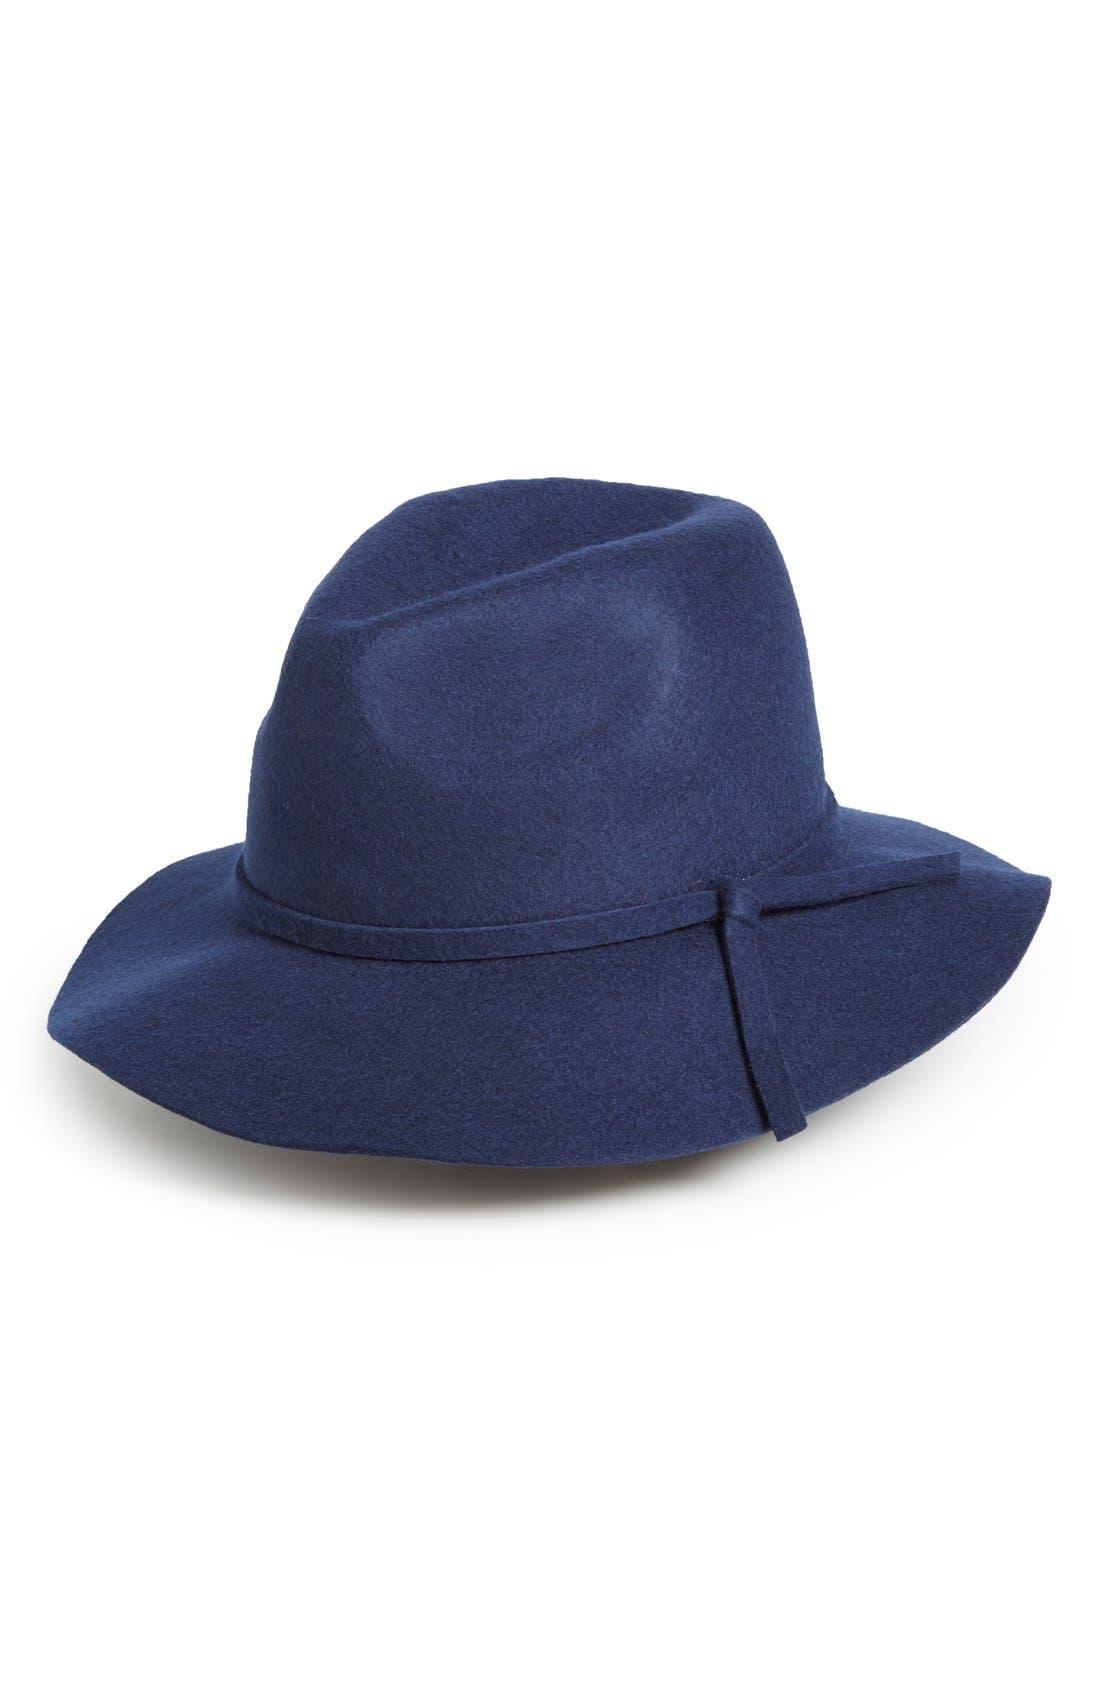 Alternate Image 1 Selected - Emanuel GeraldoKnot Band Wool Felt Panama Hat